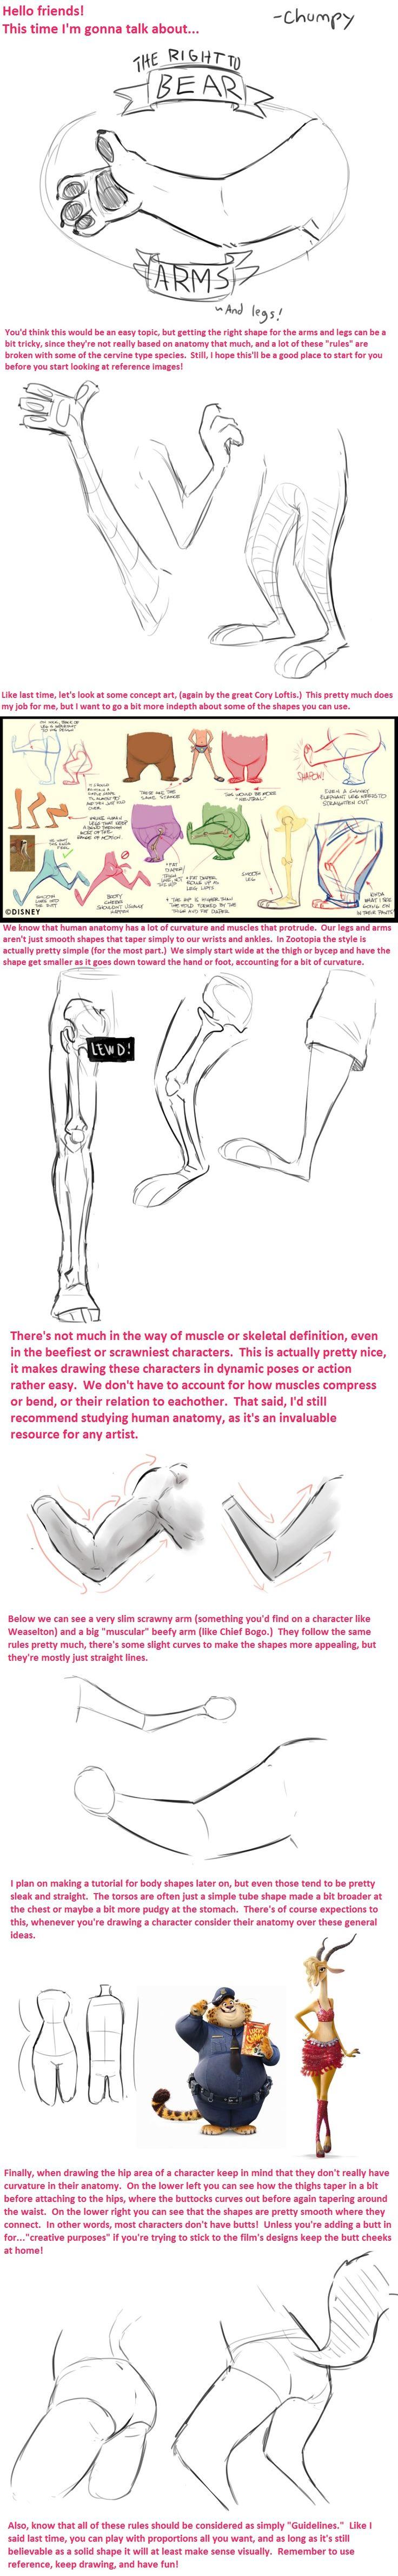 Zootopia anatomy